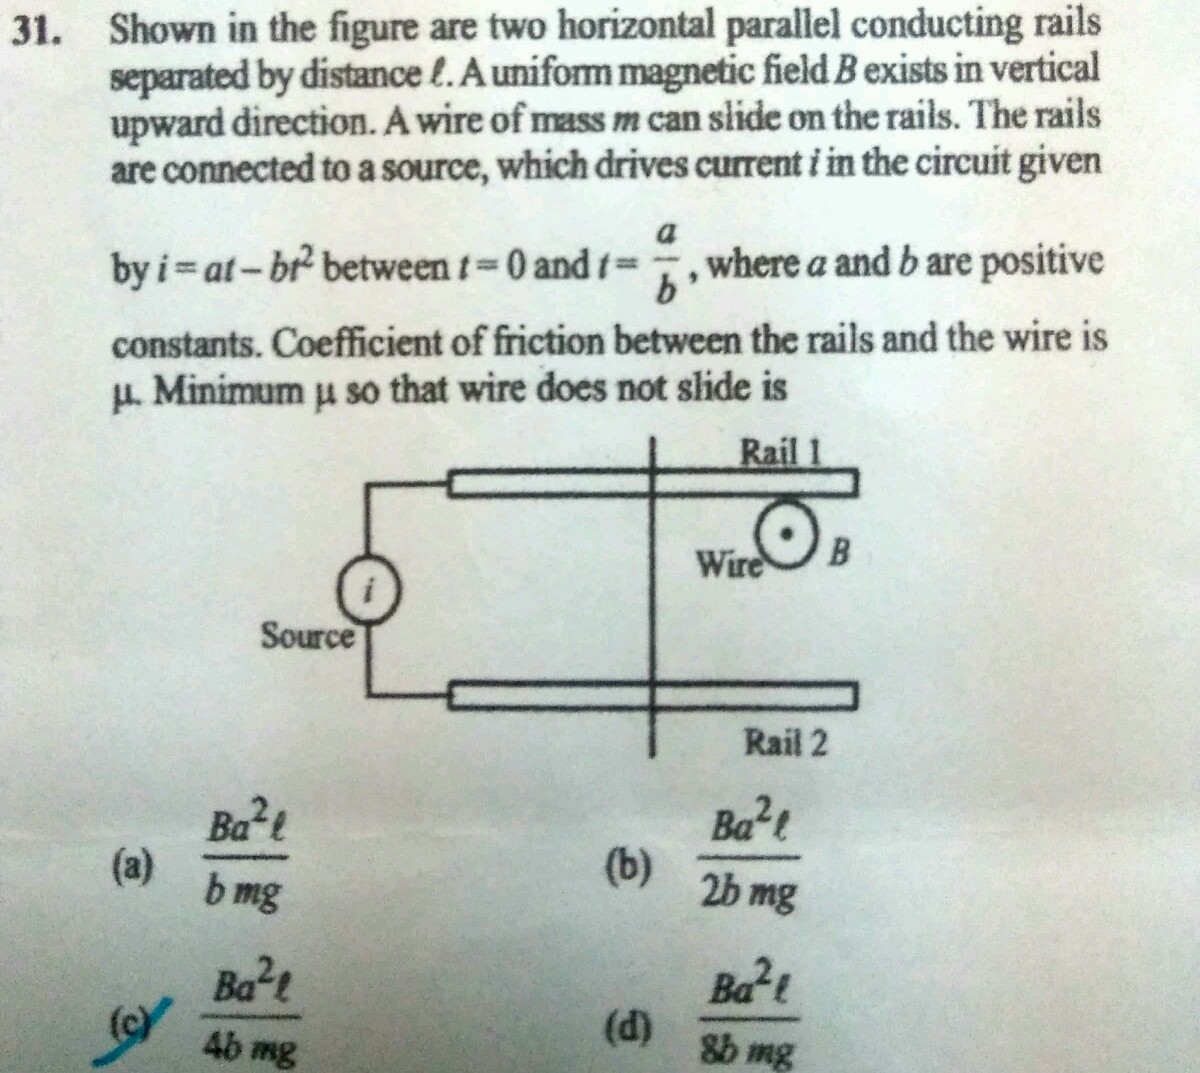 Solve it zpr2ri88 -Physics - TopperLearning.com